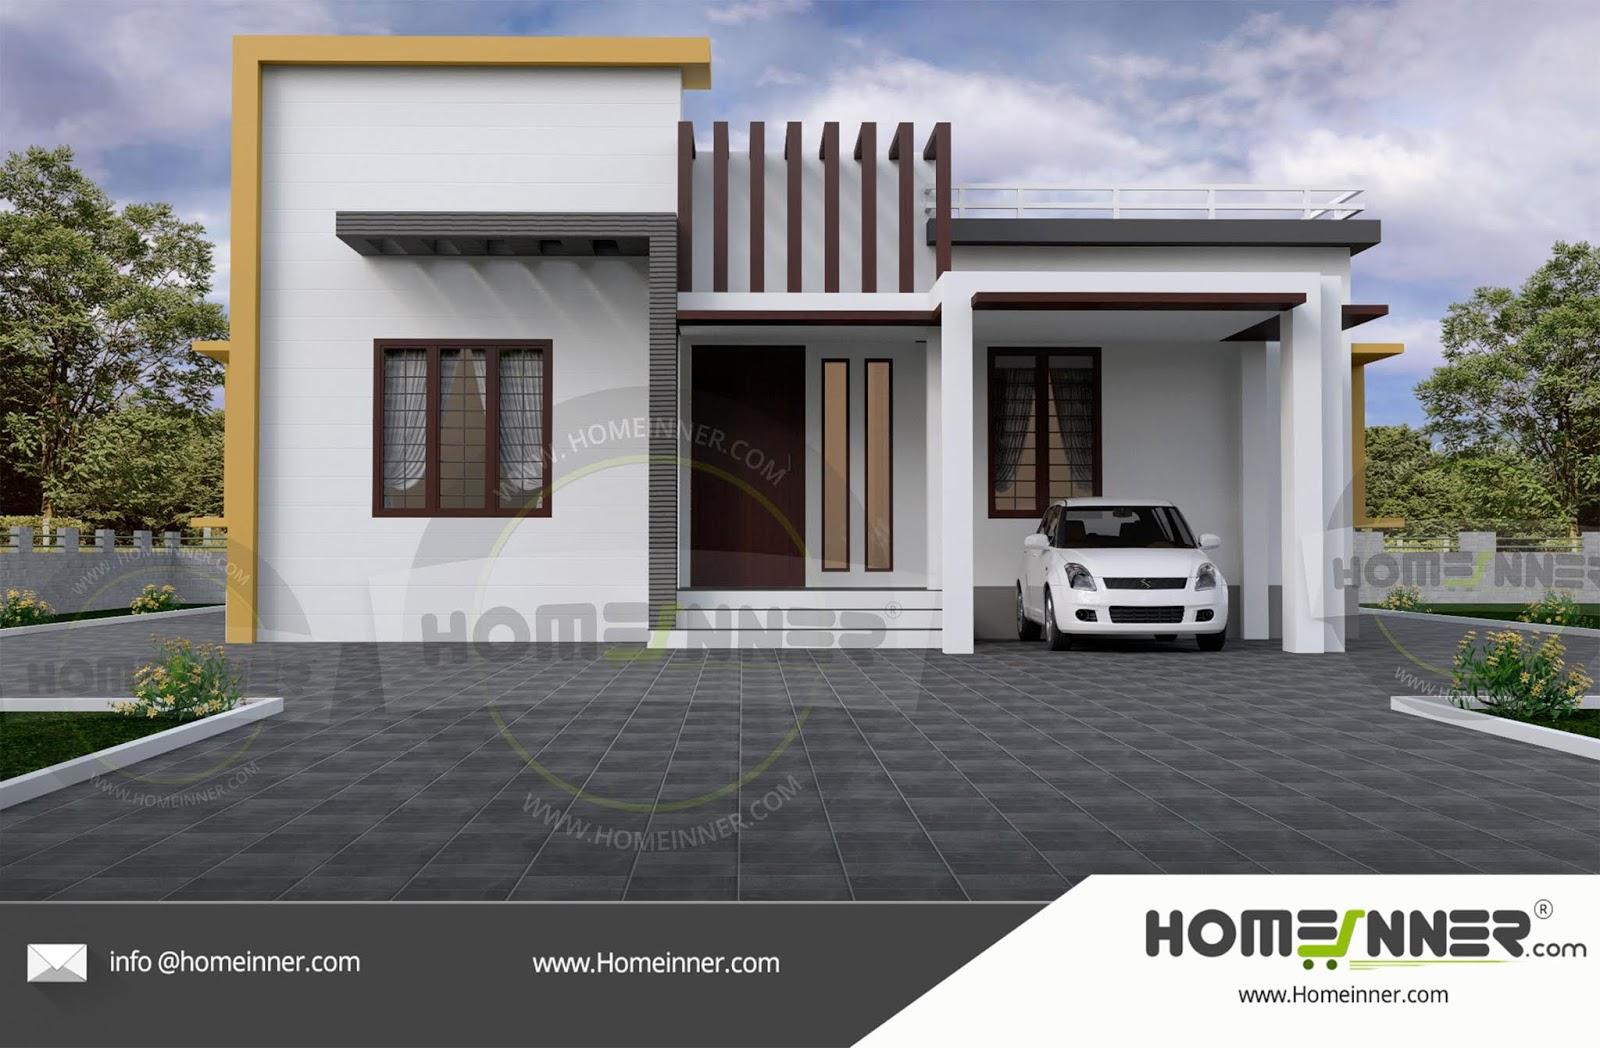 14 Lakh 3 BHK 1000 sq ft Pali Villa